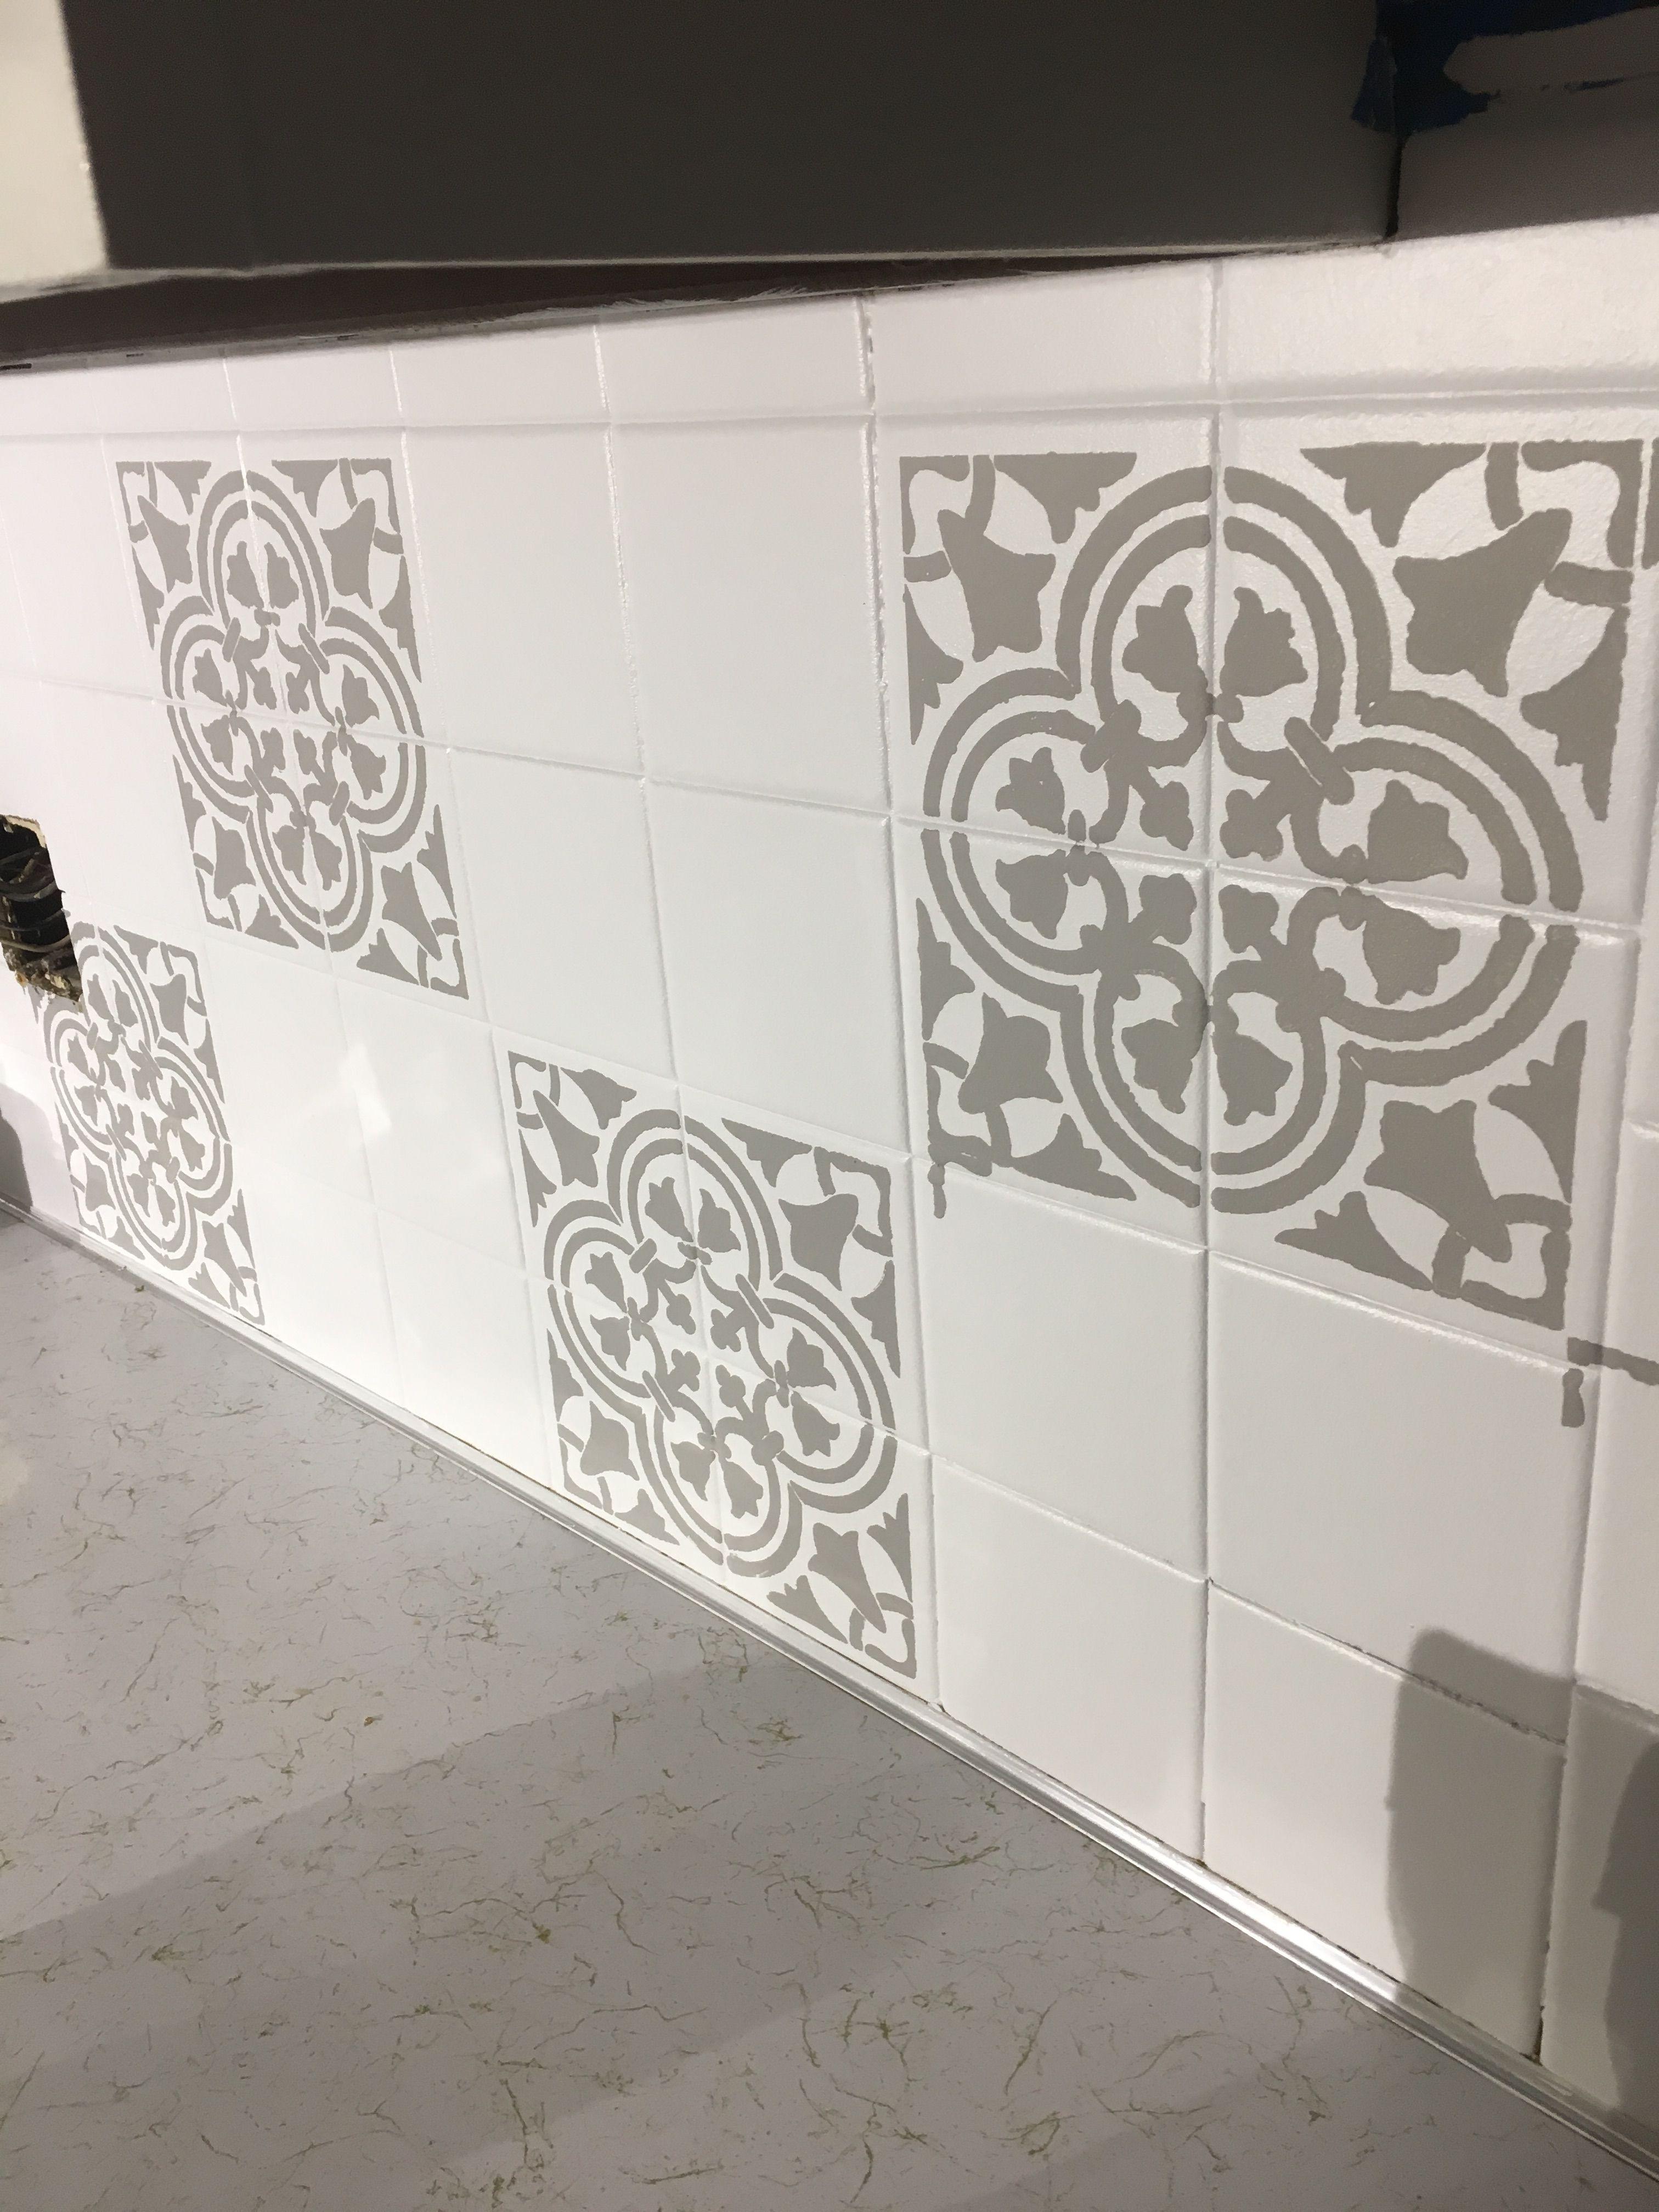 Stencil Painted Kitchen Backsplash Tile Diy Kitchen Design